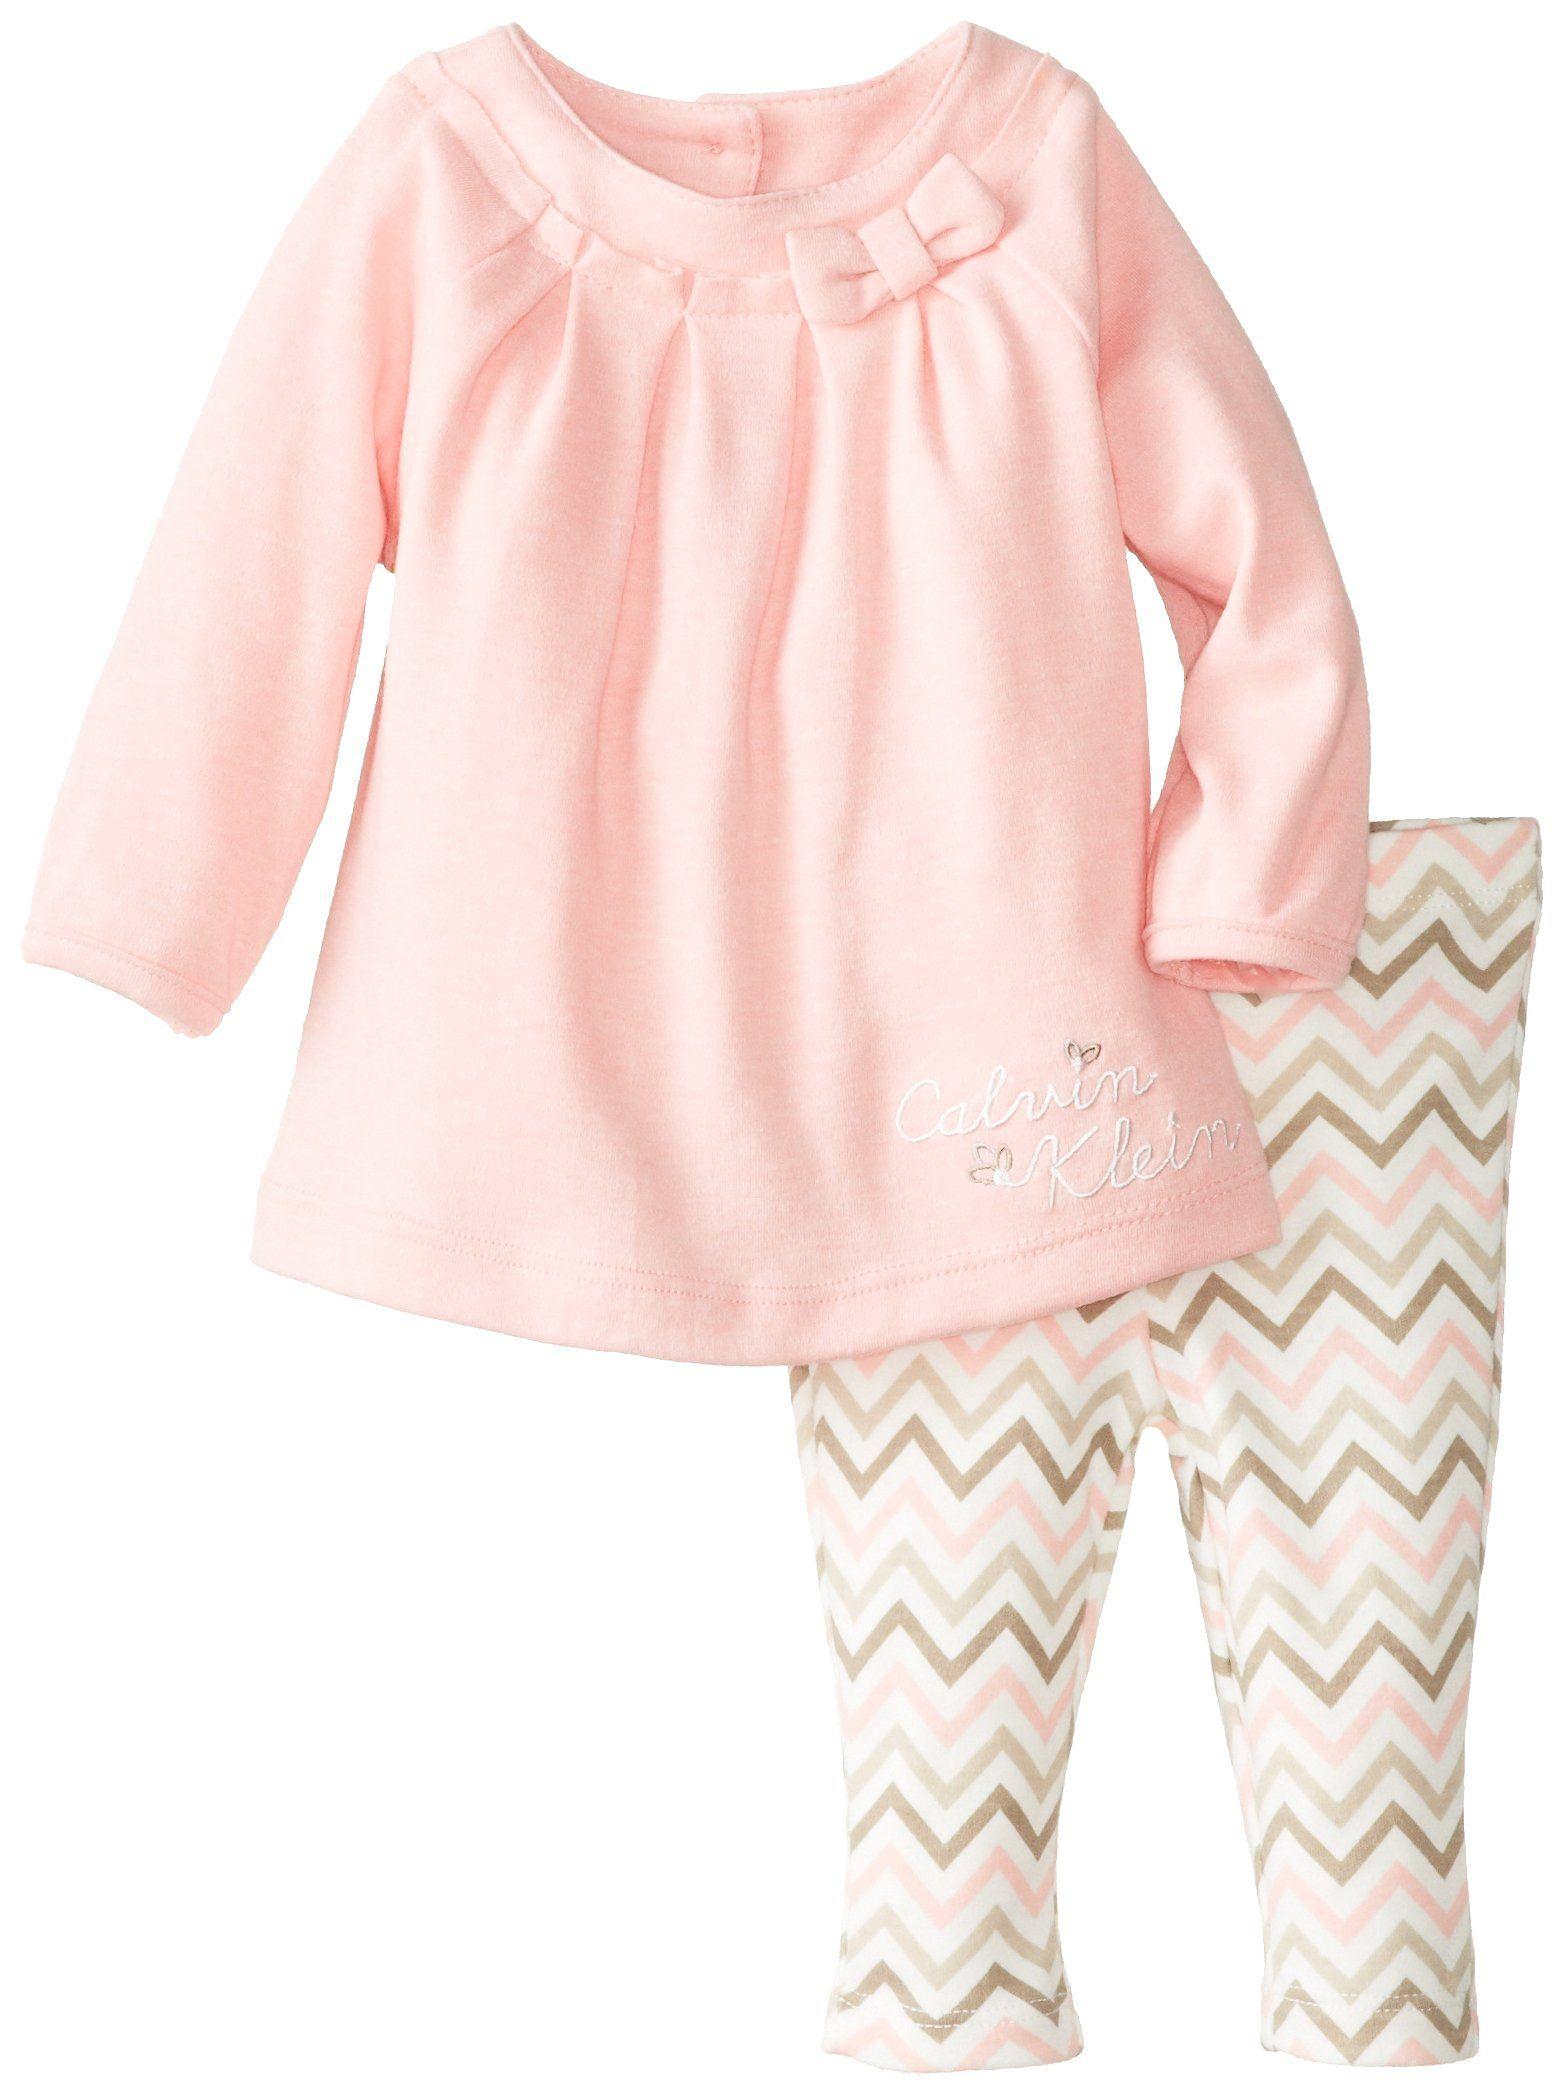 Calvin Klein Baby Girls Newborn Tunic with Printed Leggings Pink 6